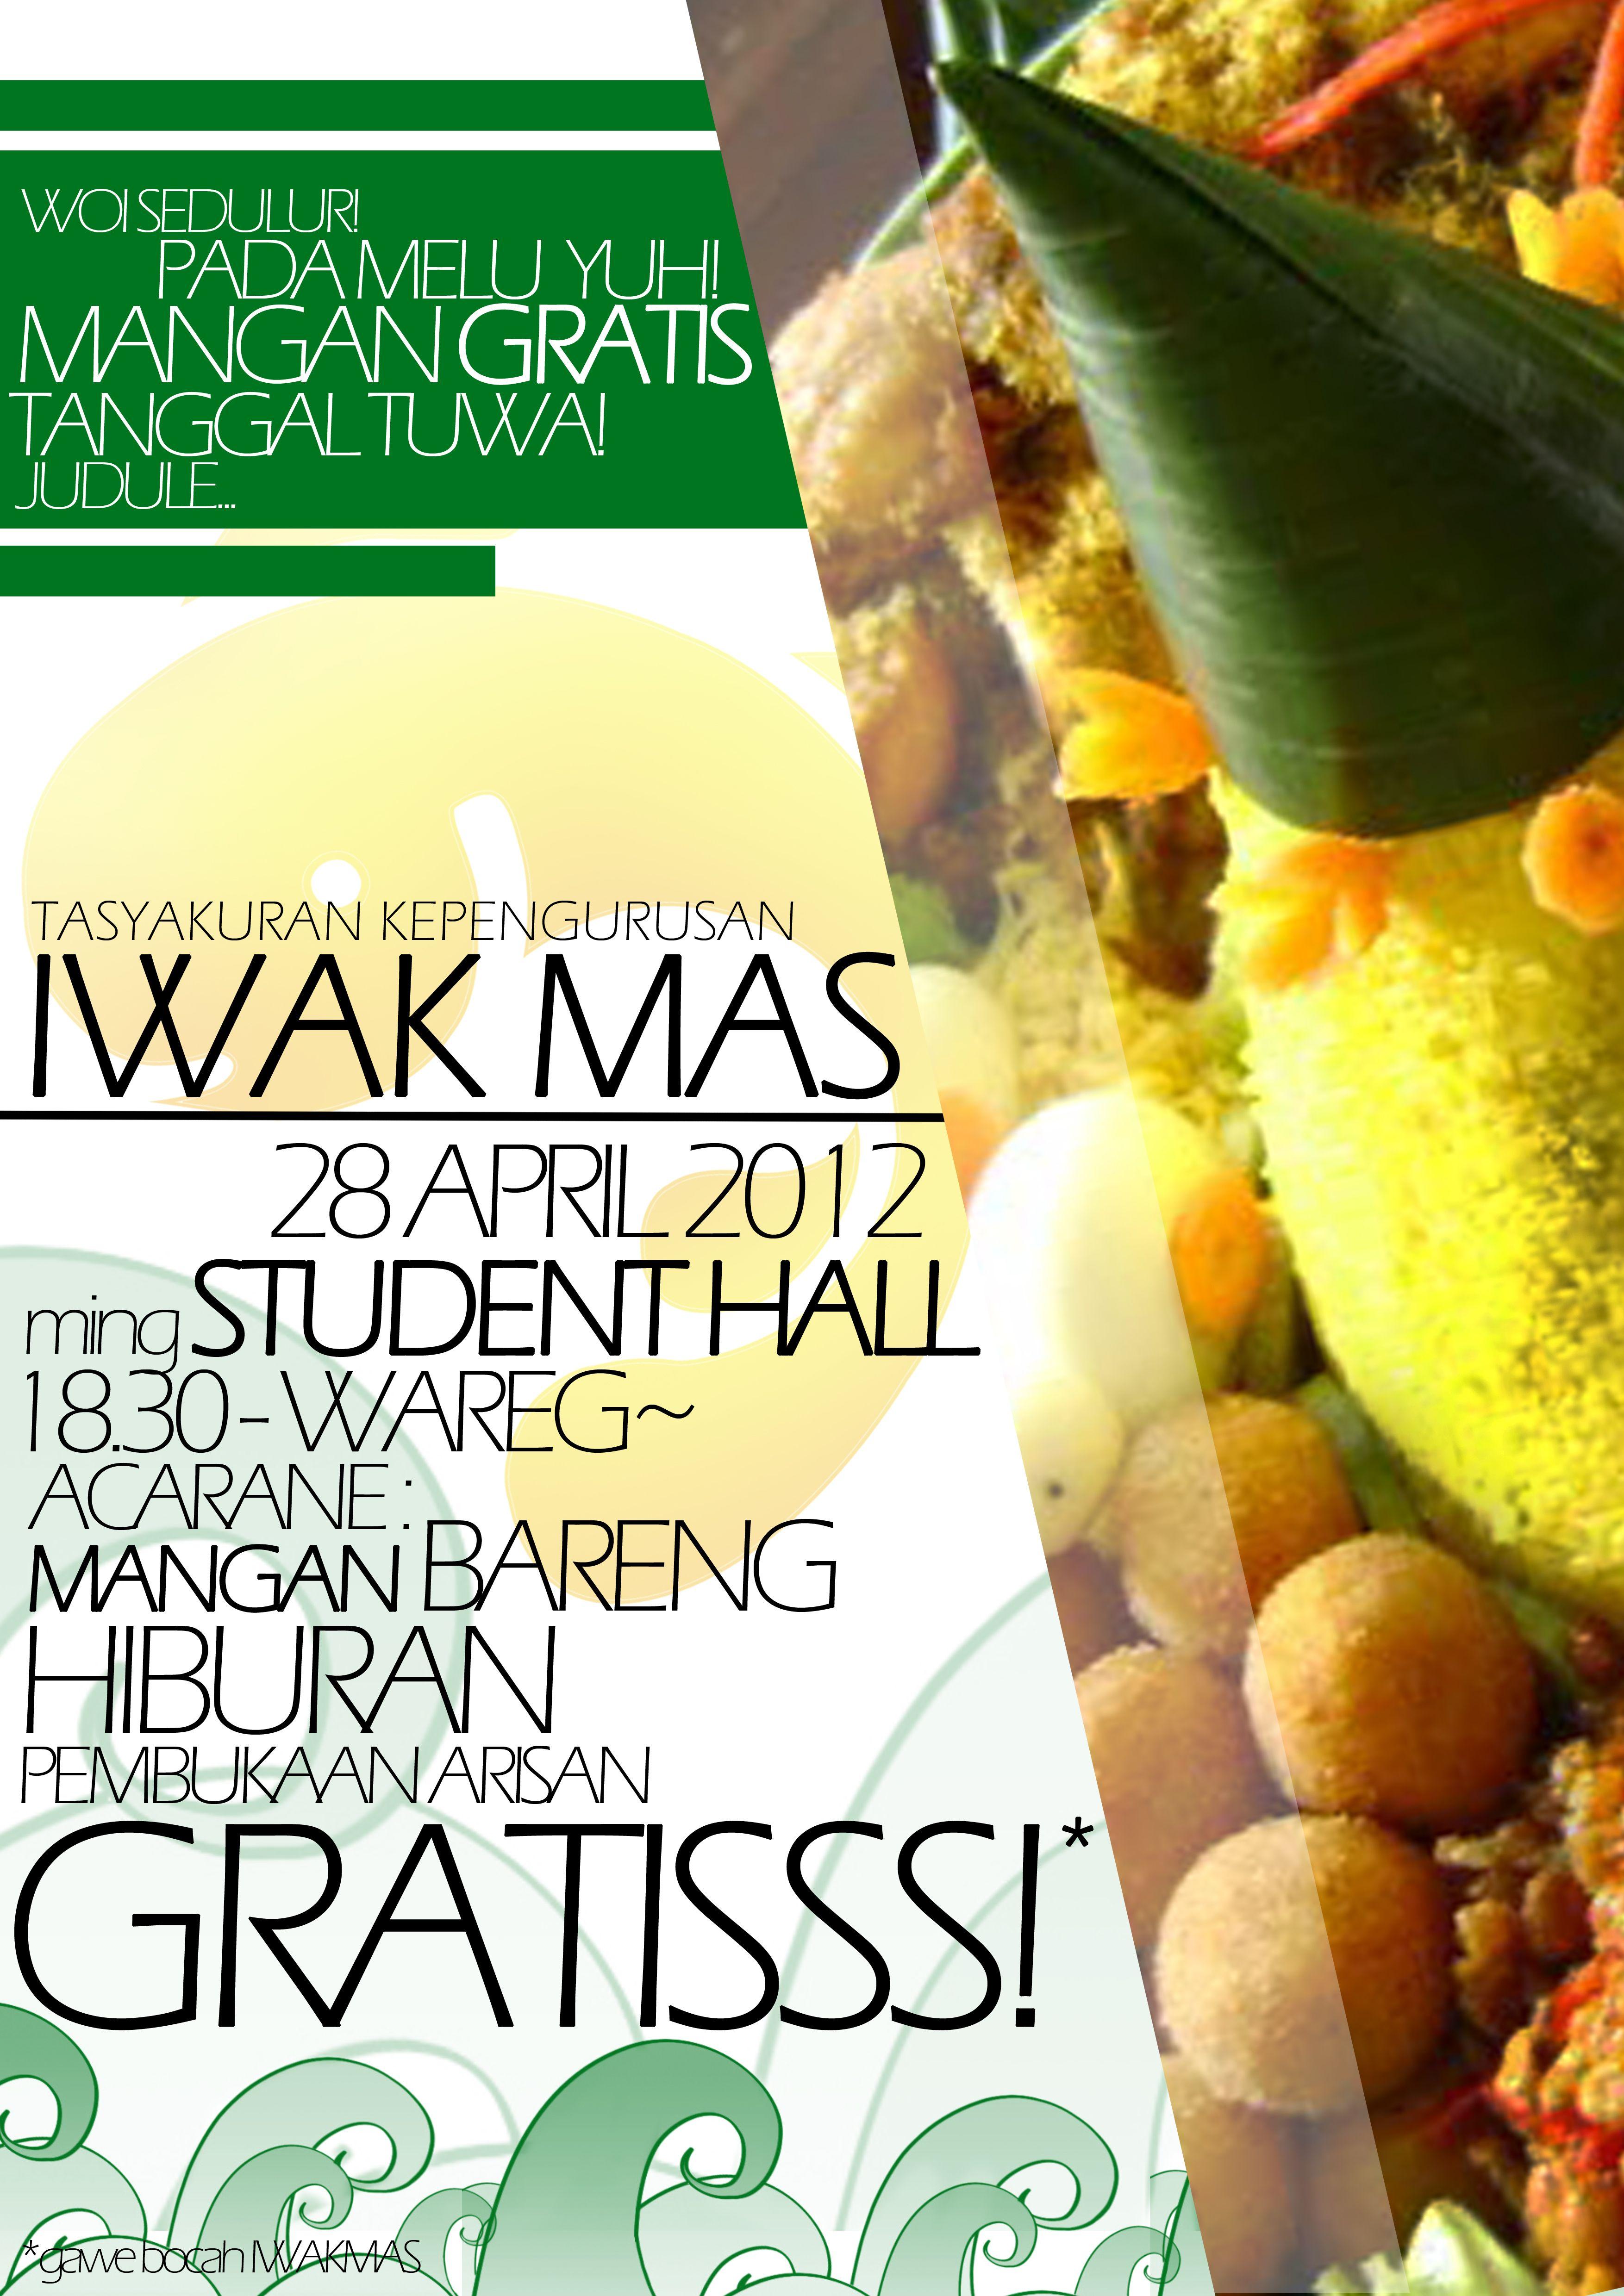 Iwakmas Halal Bihalal Posters Work Poster And Pamflets Design